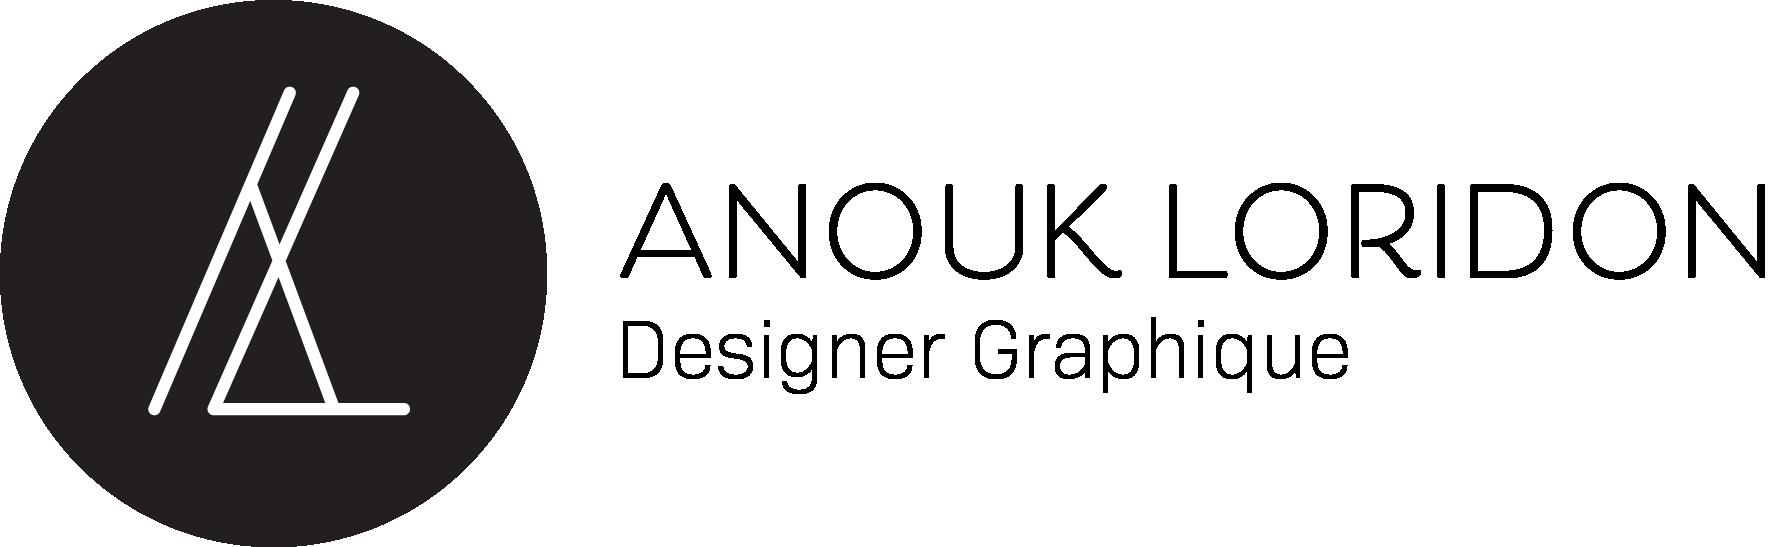 Anouk Loridon